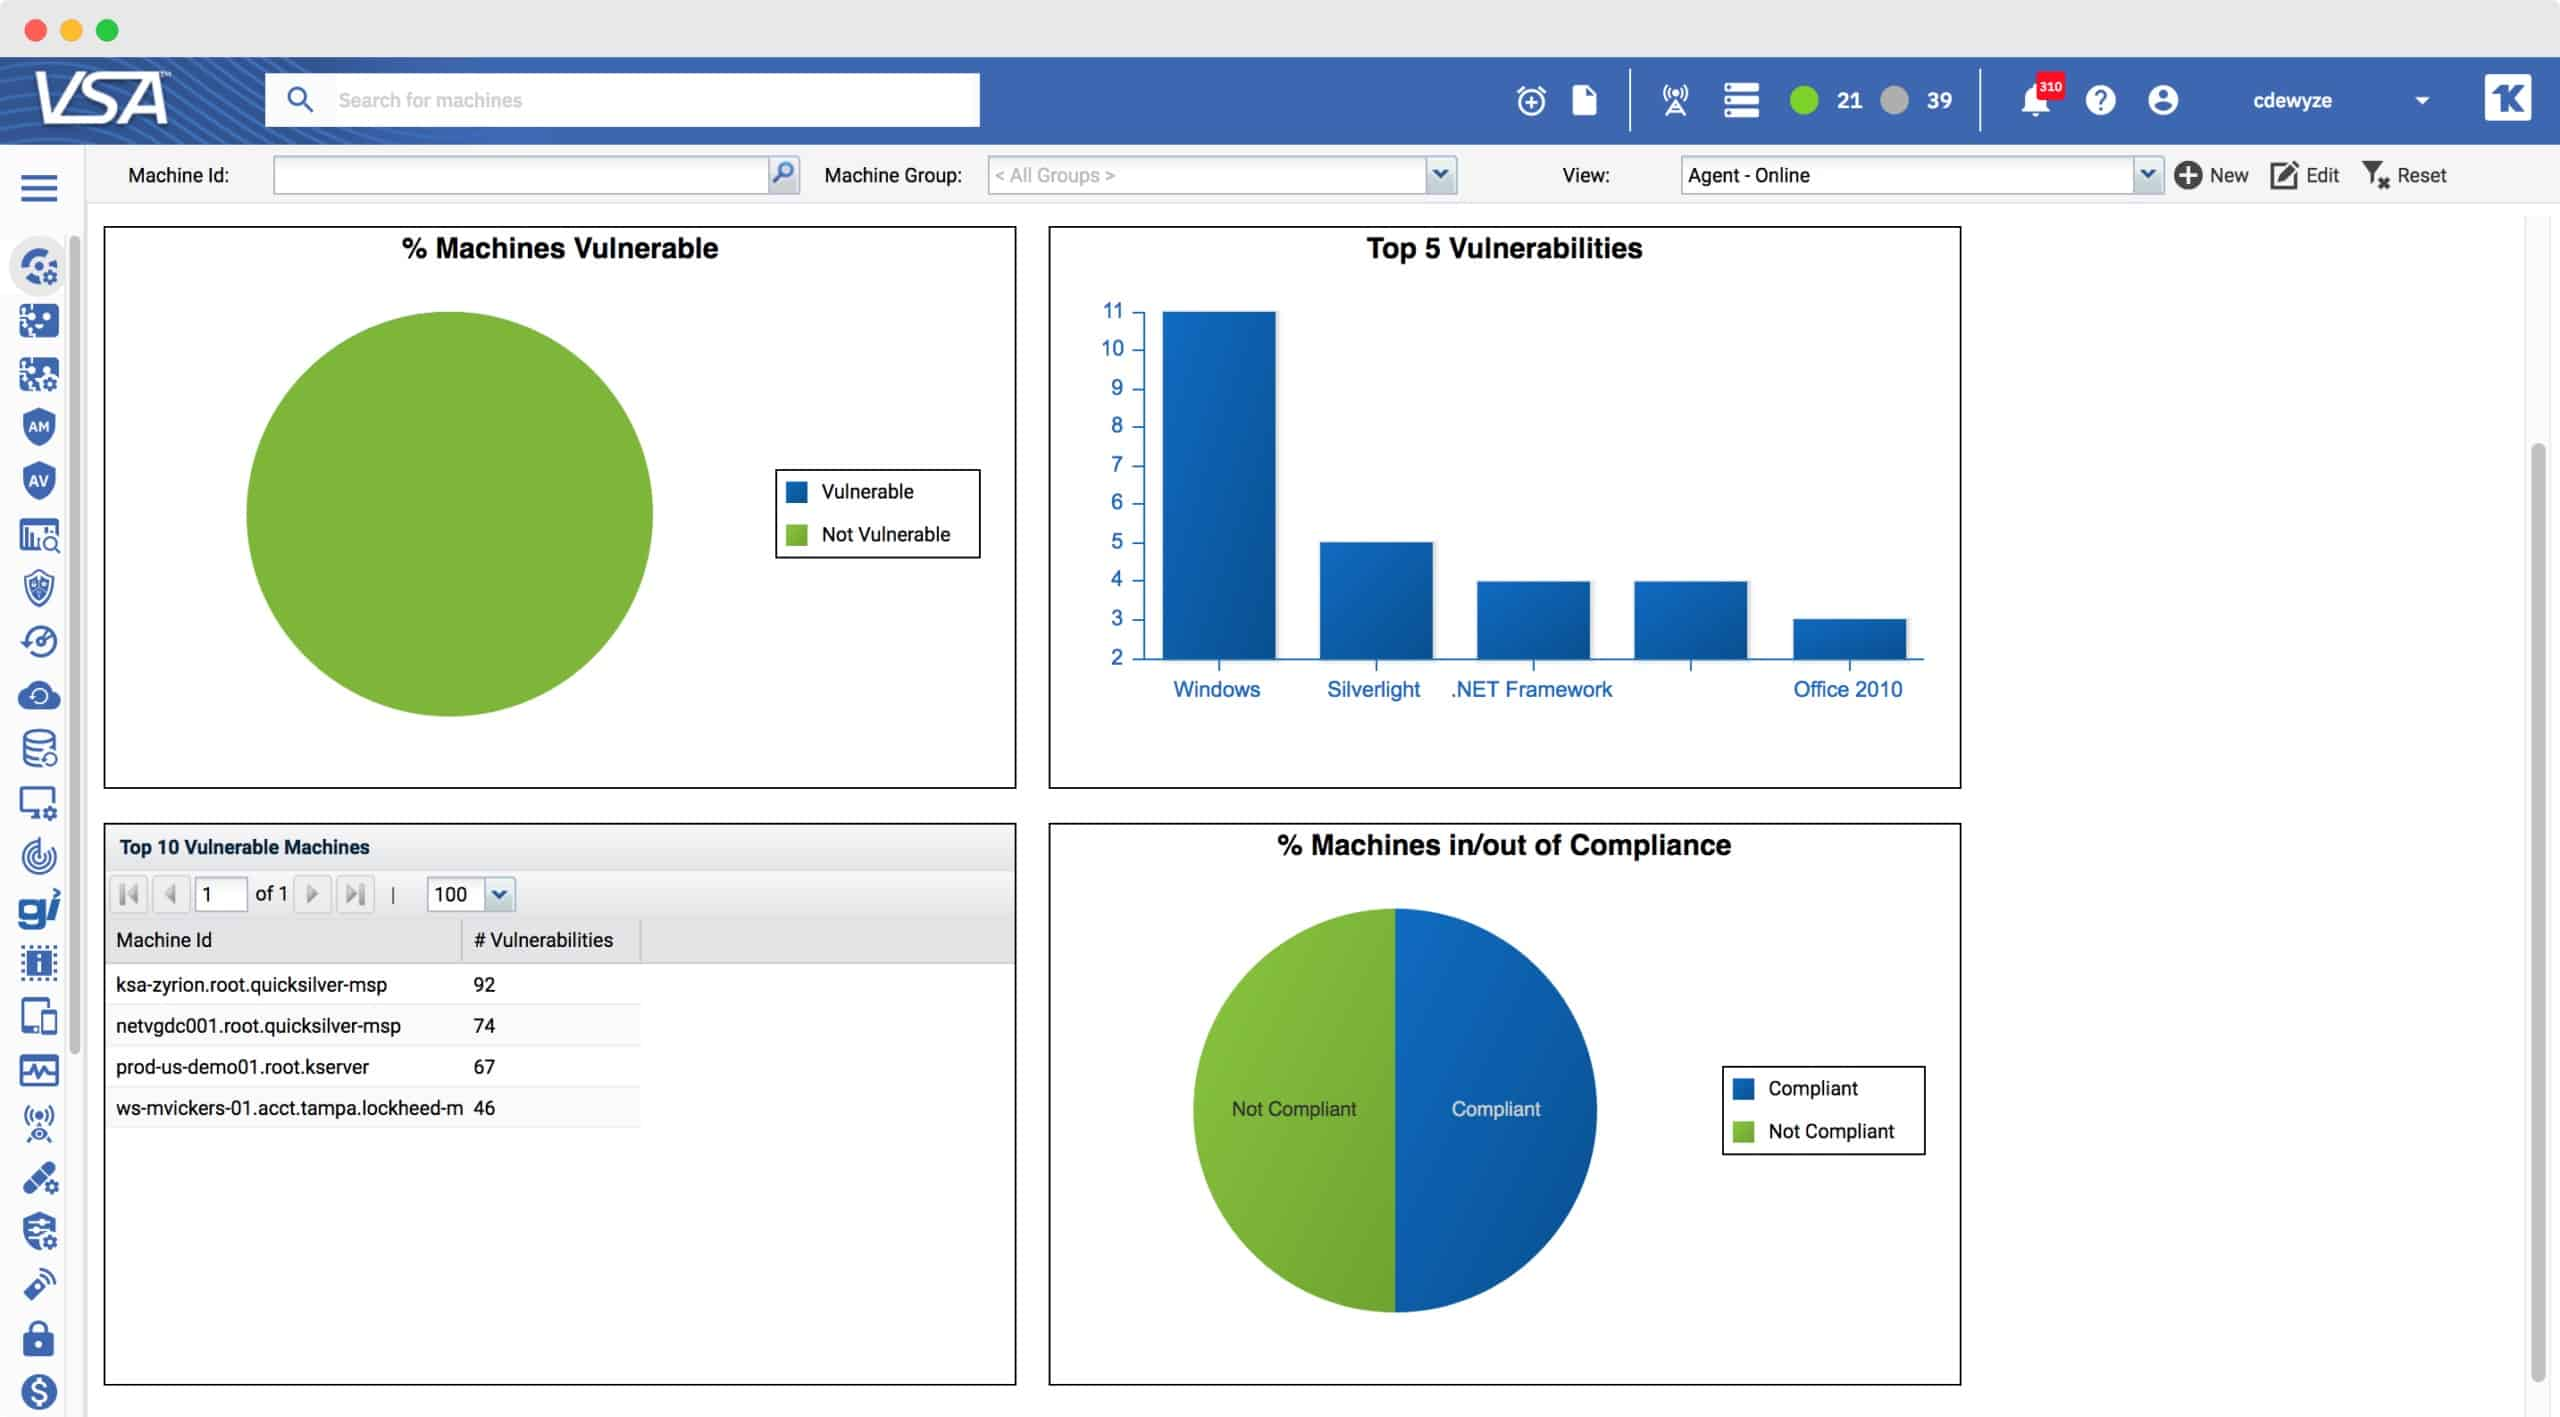 Kaseya VSA Patch Management Software dashboard